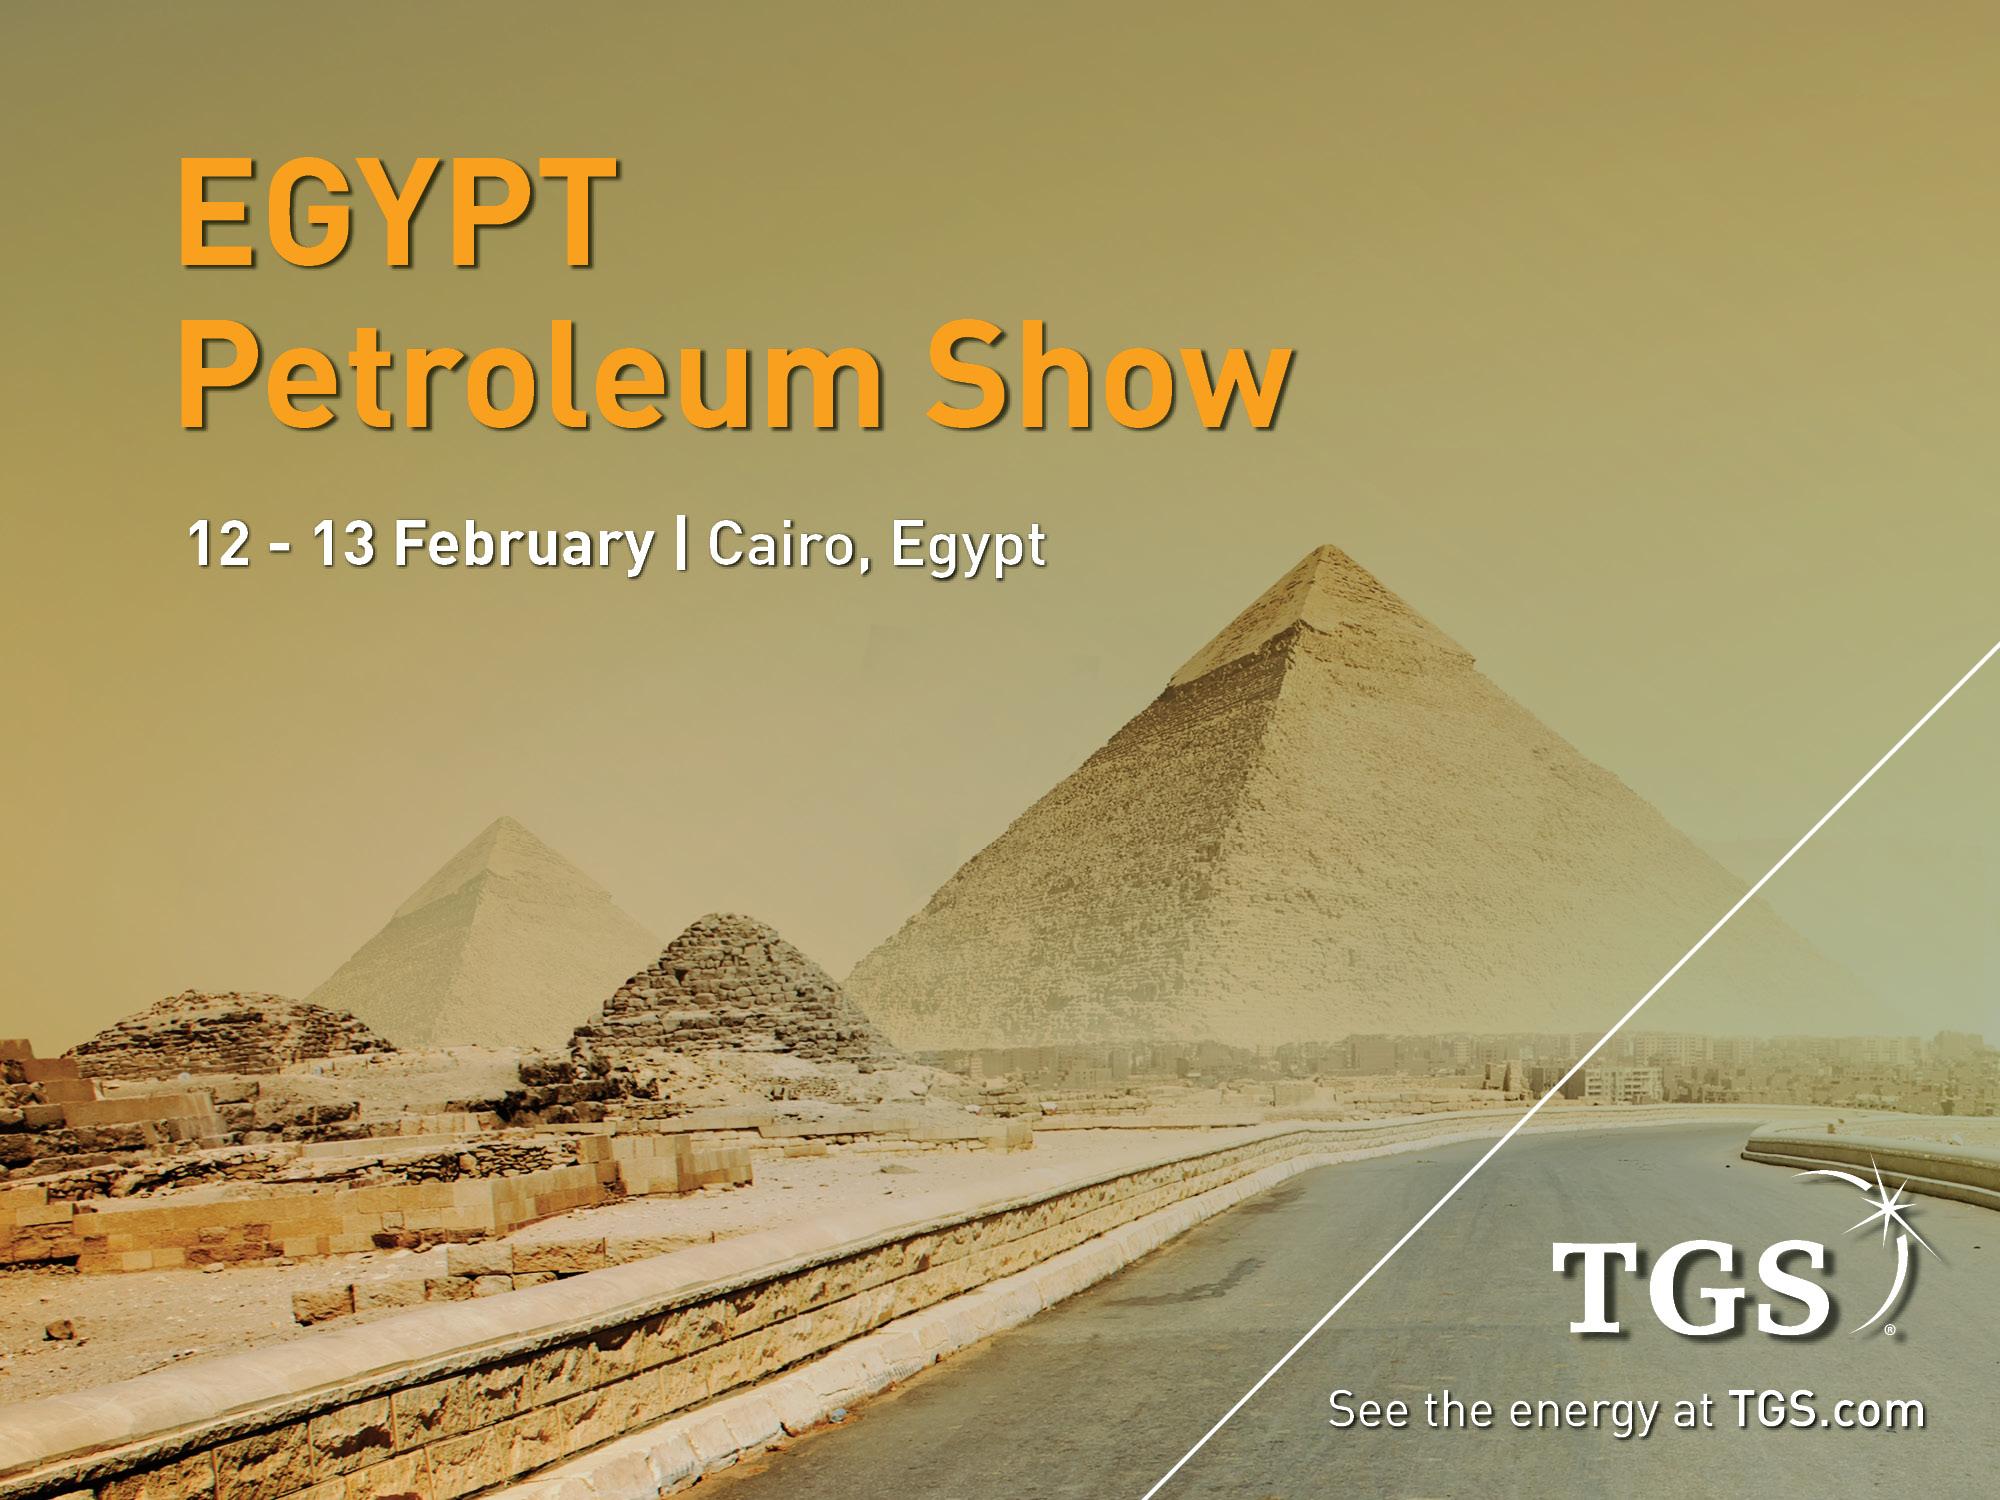 Egypt-Petroleum Show_480x360px